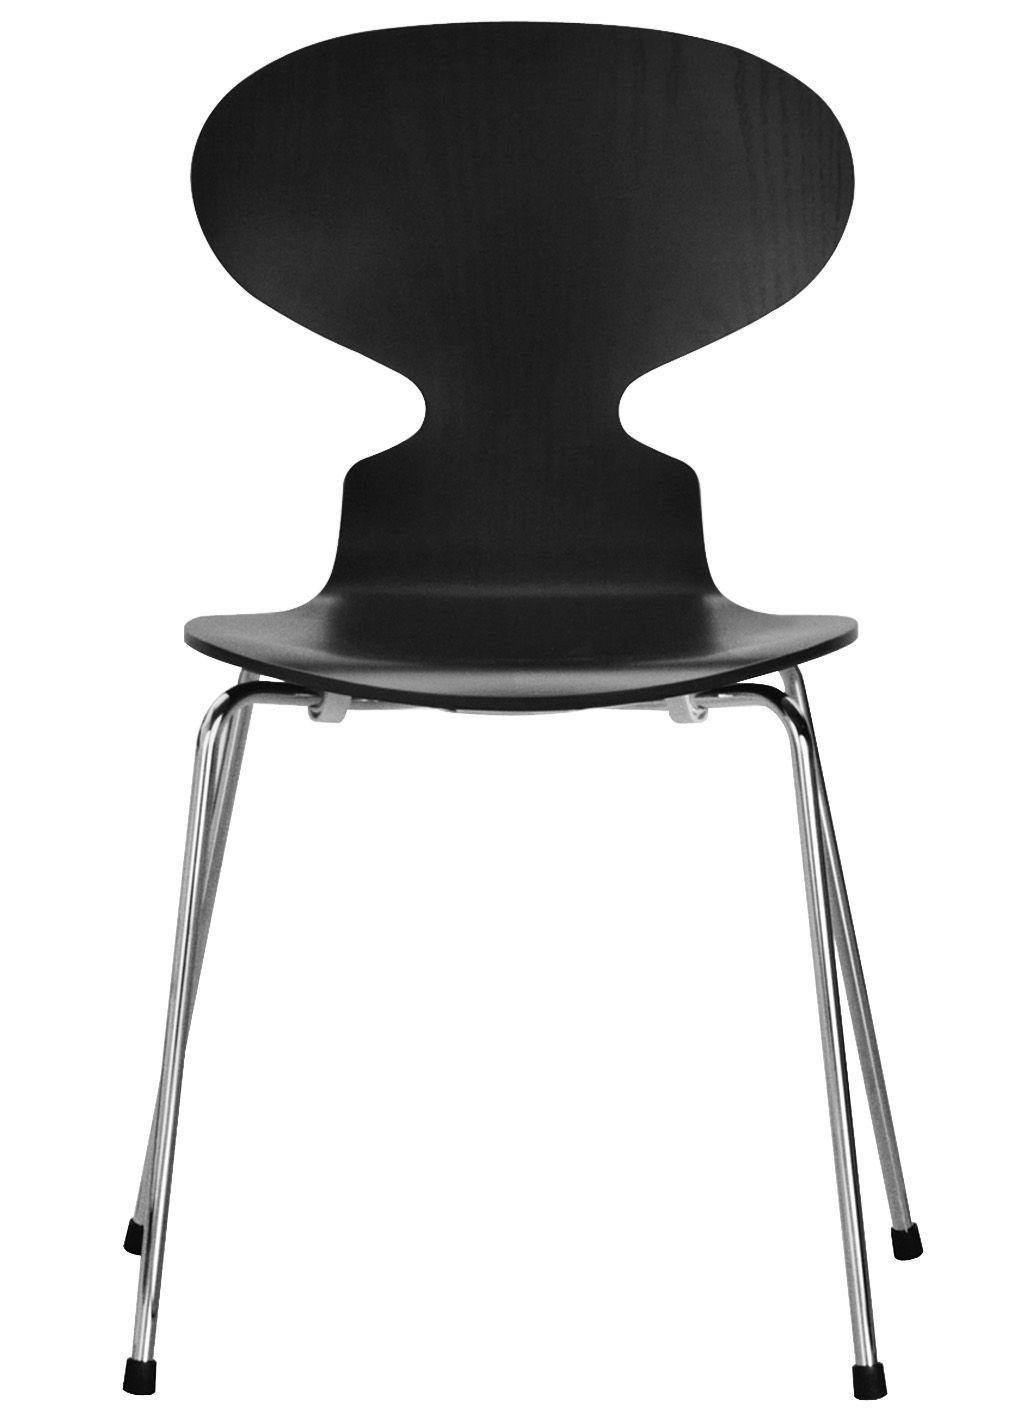 Möbel - Stühle  - Fourmi Stapelbarer Stuhl 4 Füße - Fritz Hansen - Schwarz - Contreplaqué de frêne teinté, Stahl